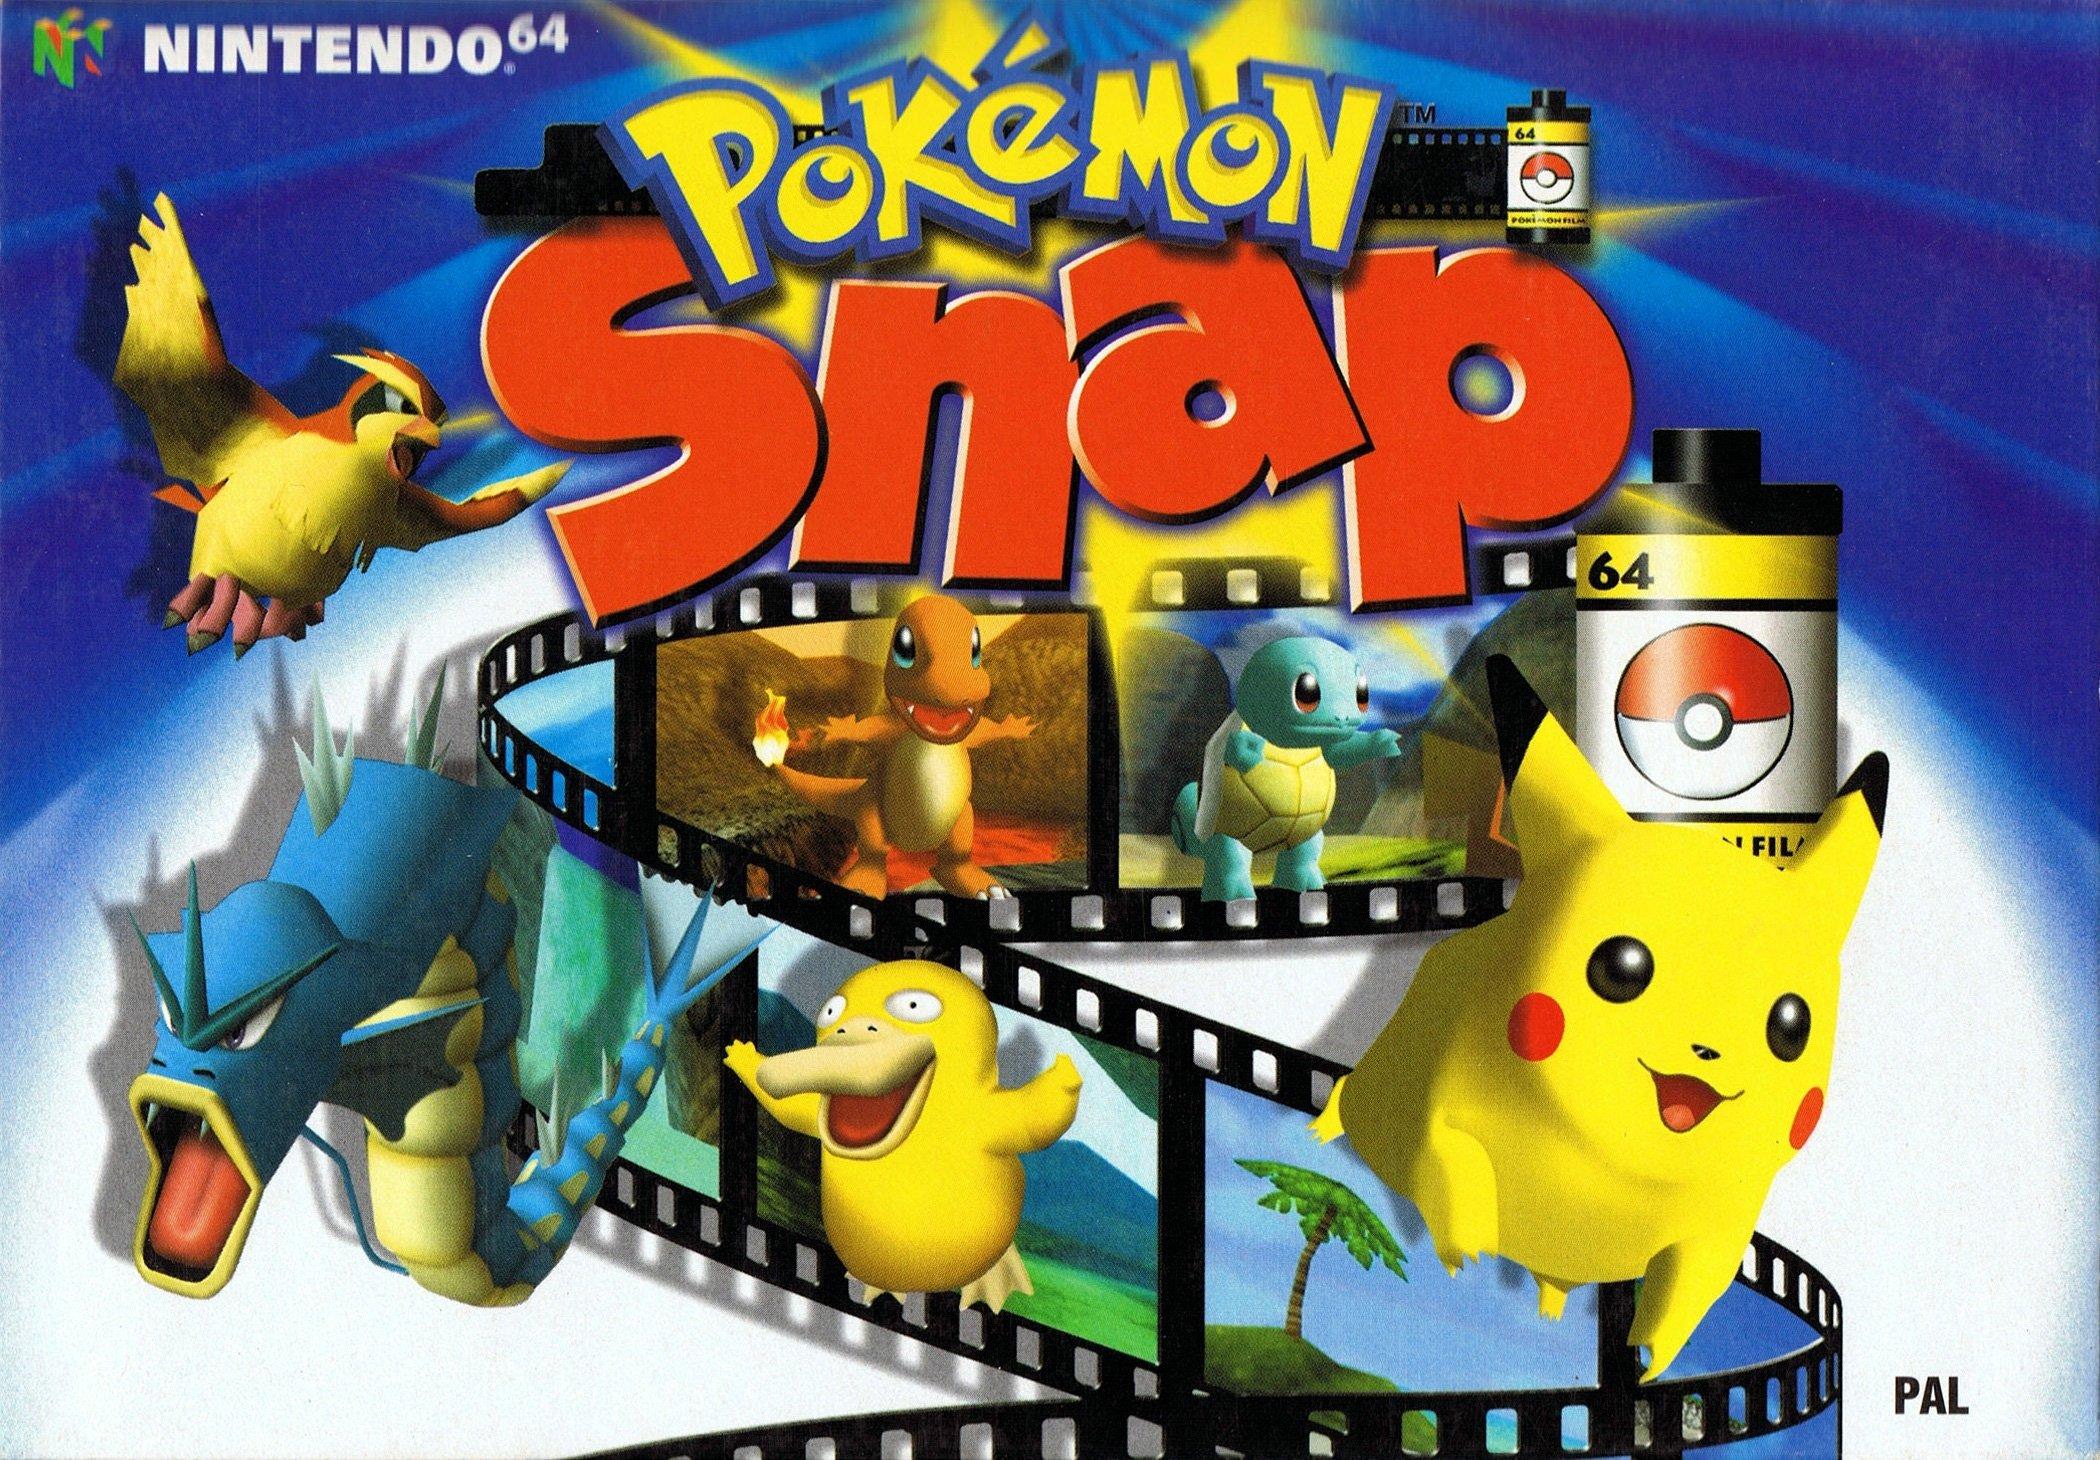 Pokemon Snap still stands in 2021